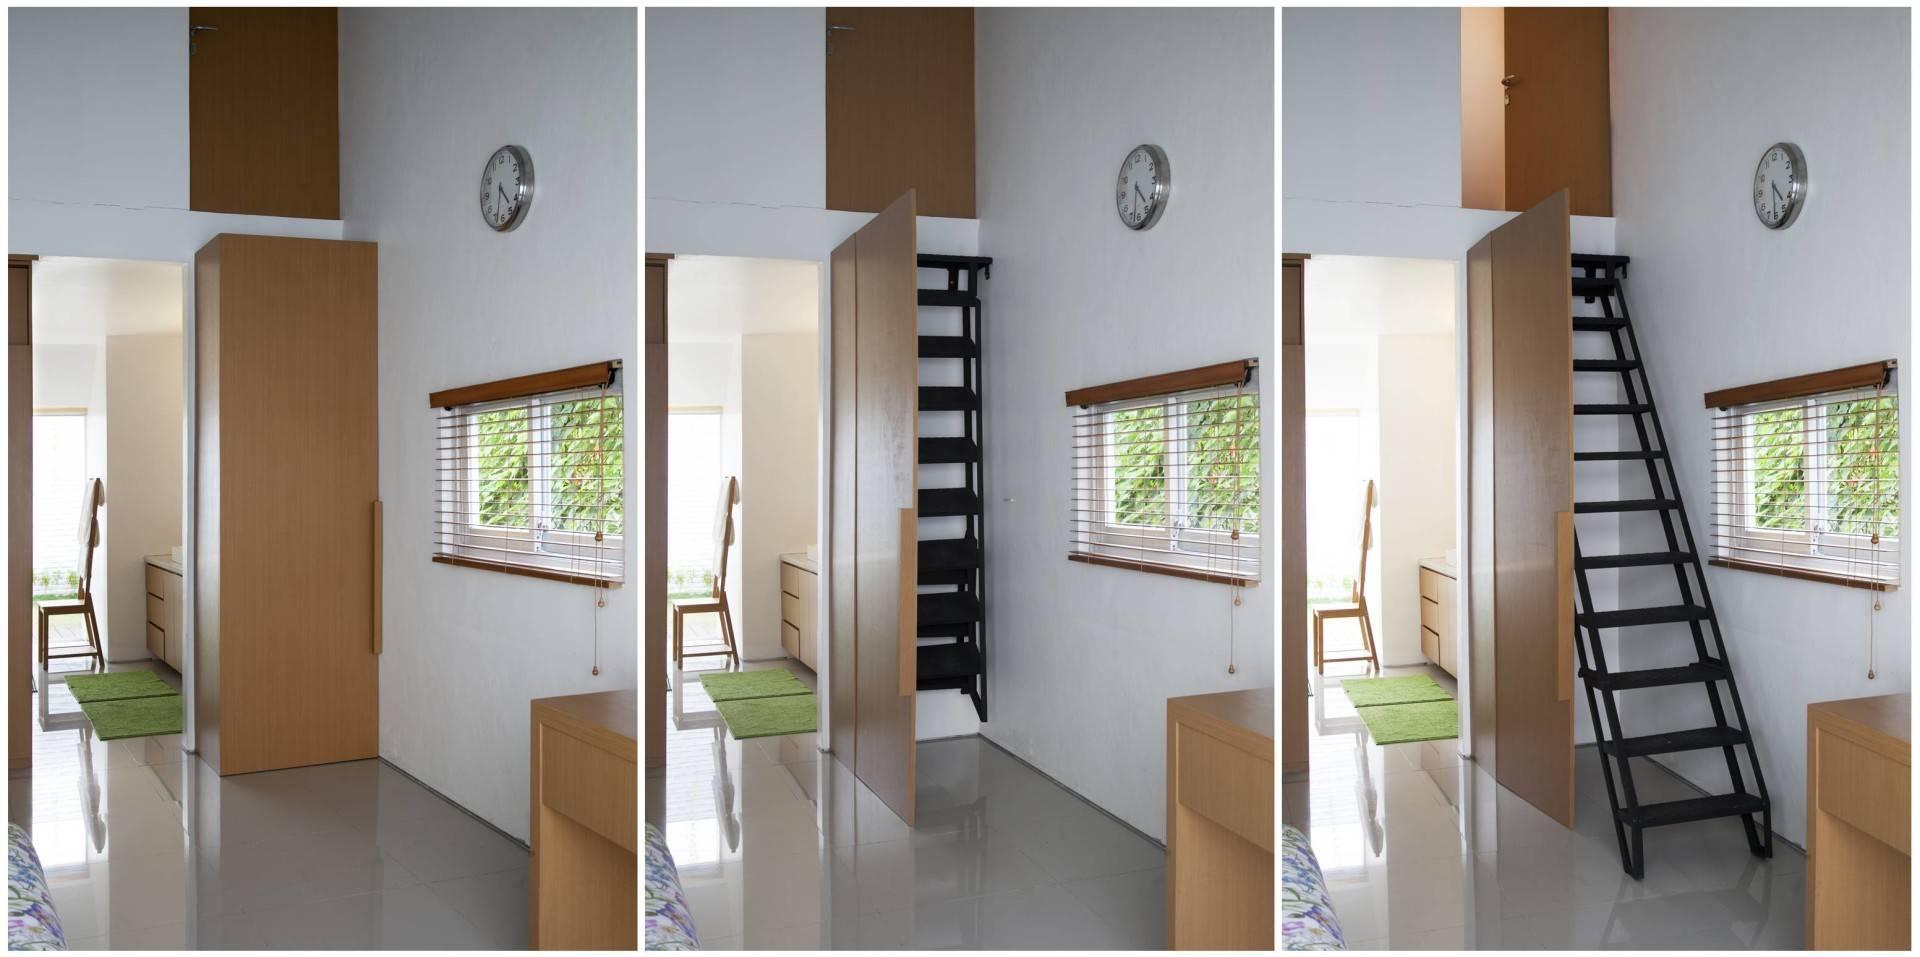 Sontang M Siregar Dj House Bengkulu, Indonesia Bengkulu, Indonesia Rollaway-Stairs Minimalis  6081